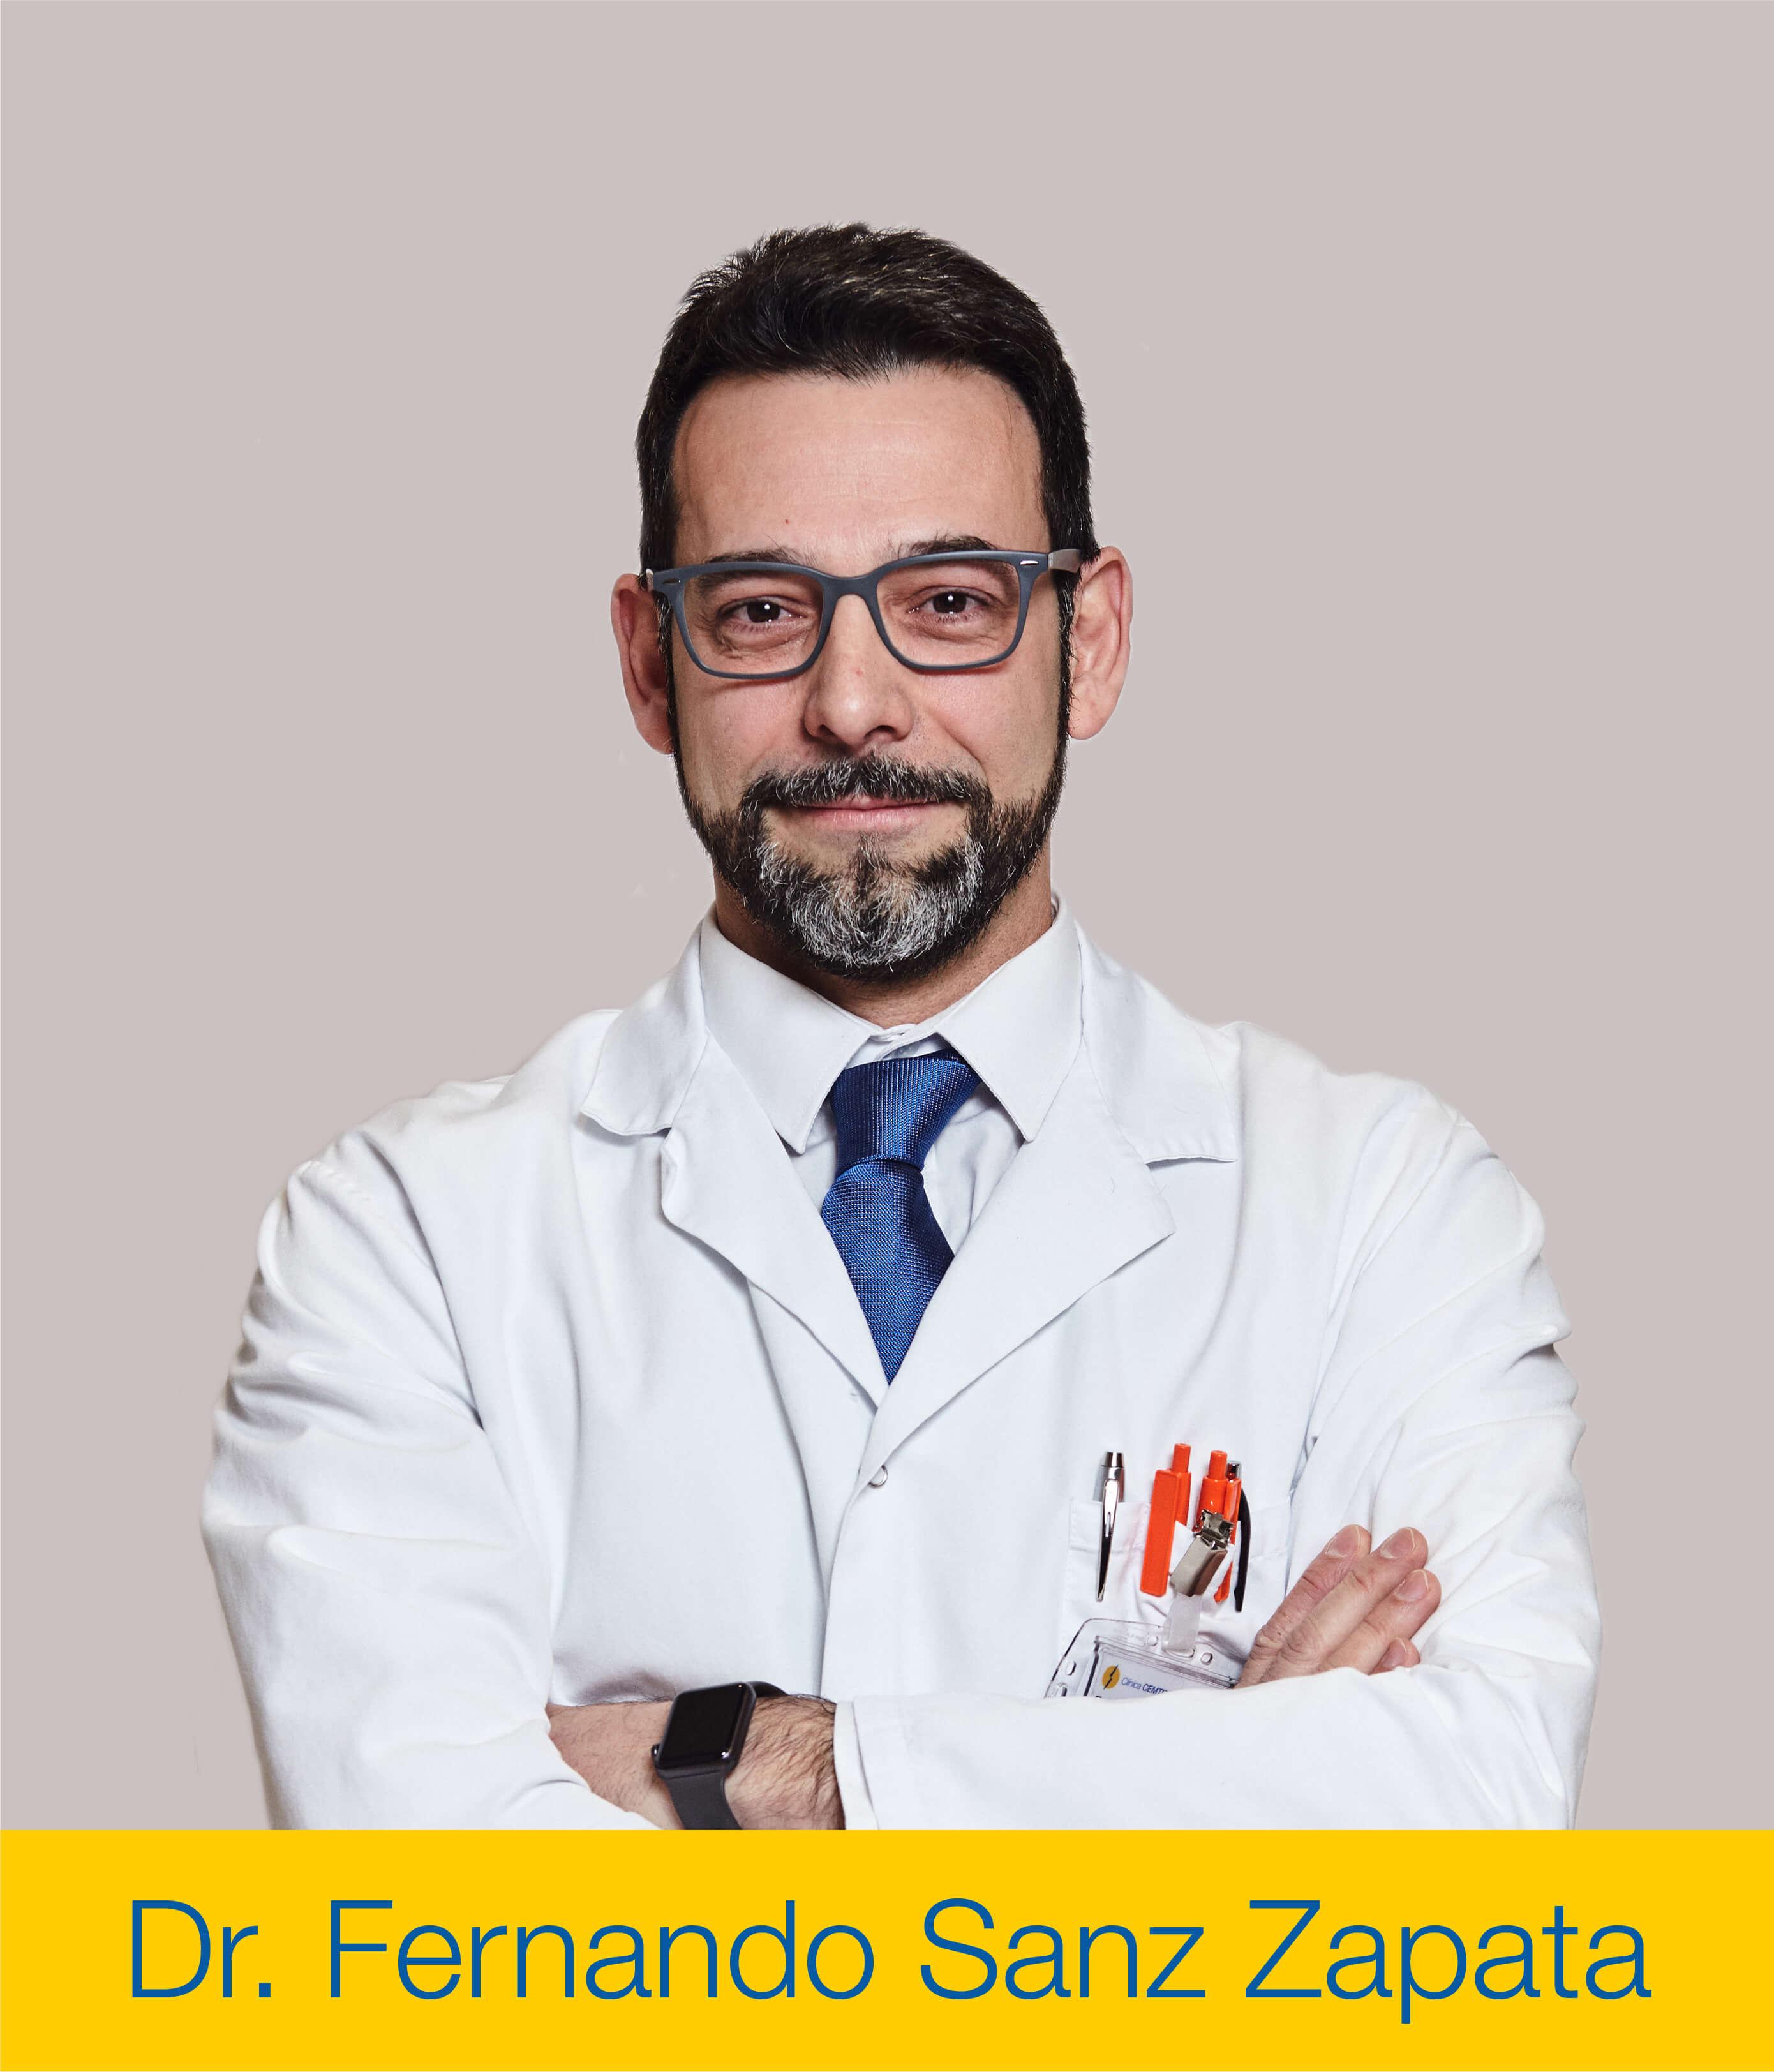 Dr Sanz Zapata Rotura Menisco